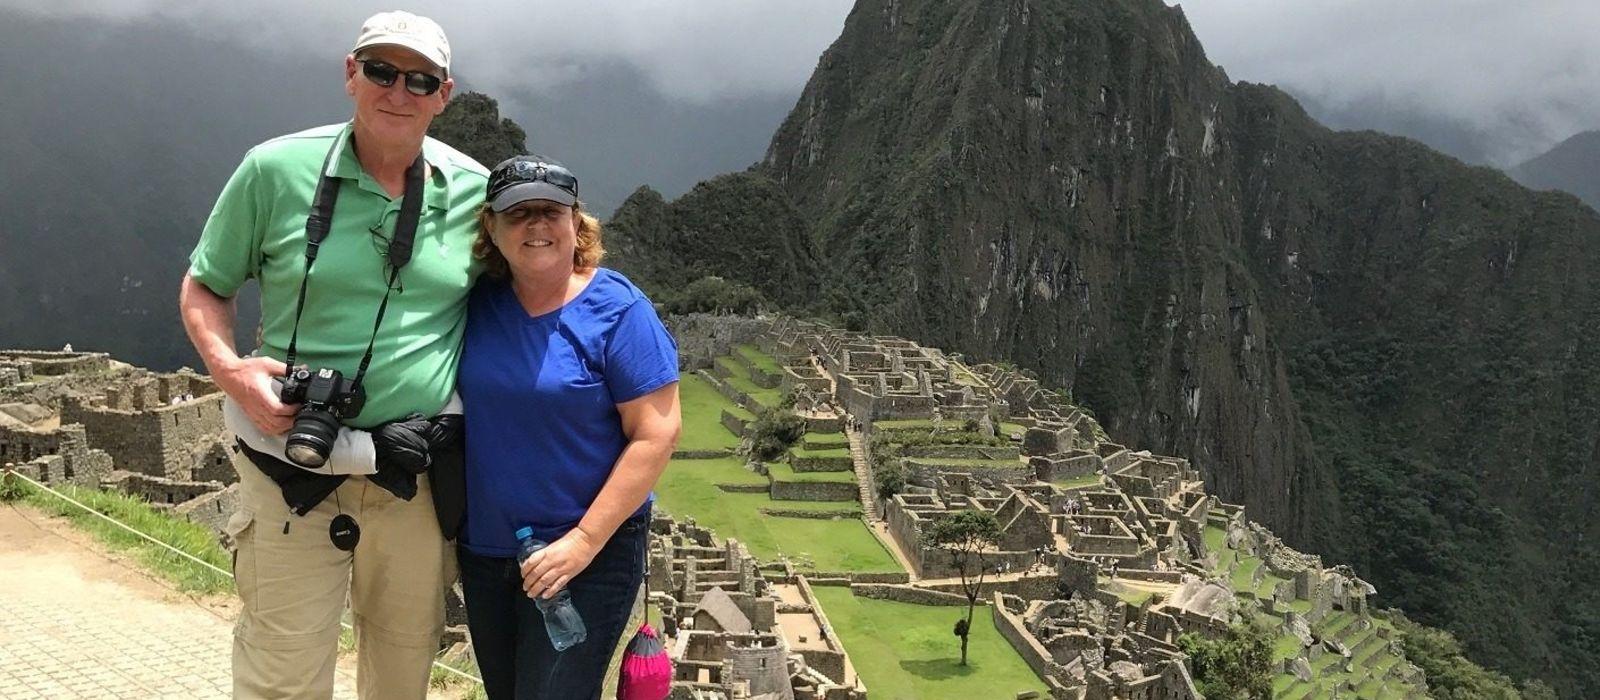 Glenn Frank Enchanting Travels Guest in Machu Picchu Peru South America